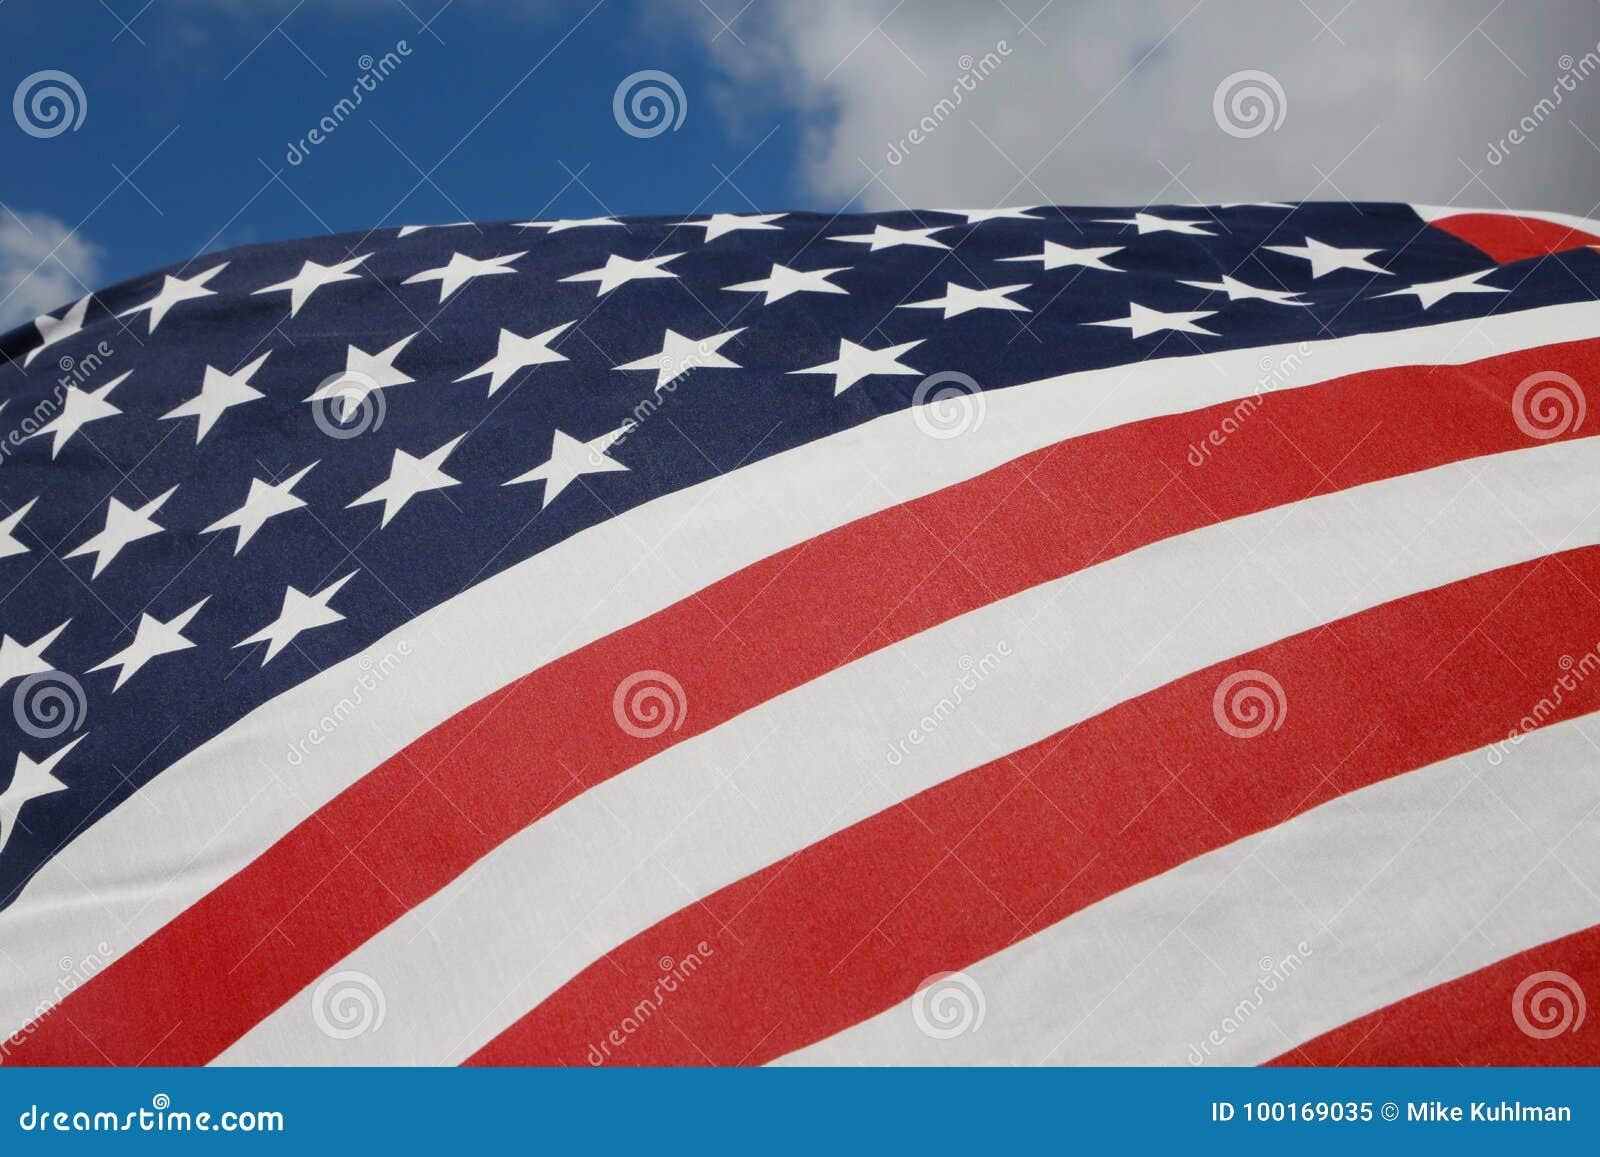 19ec01d4081 American Flag stock image. Image of horizontal